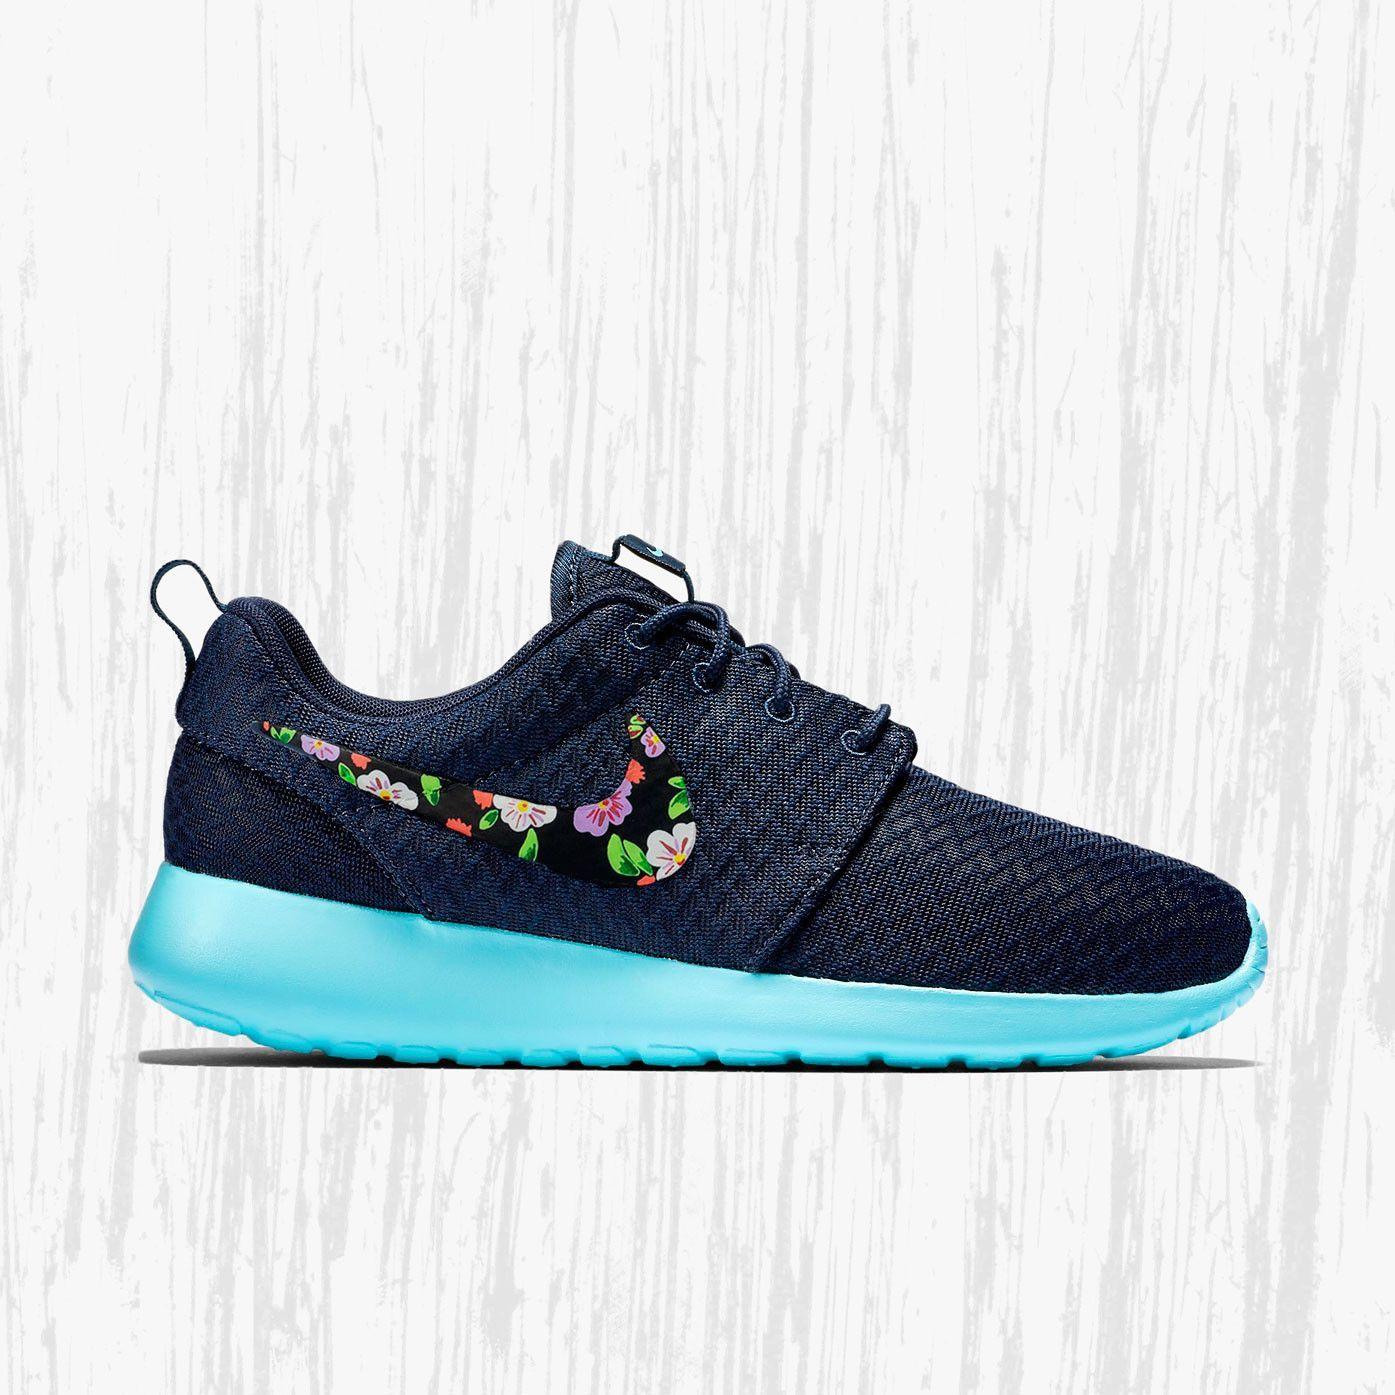 Nike Roshe Custom Floral design, Hand painted floral, lilac